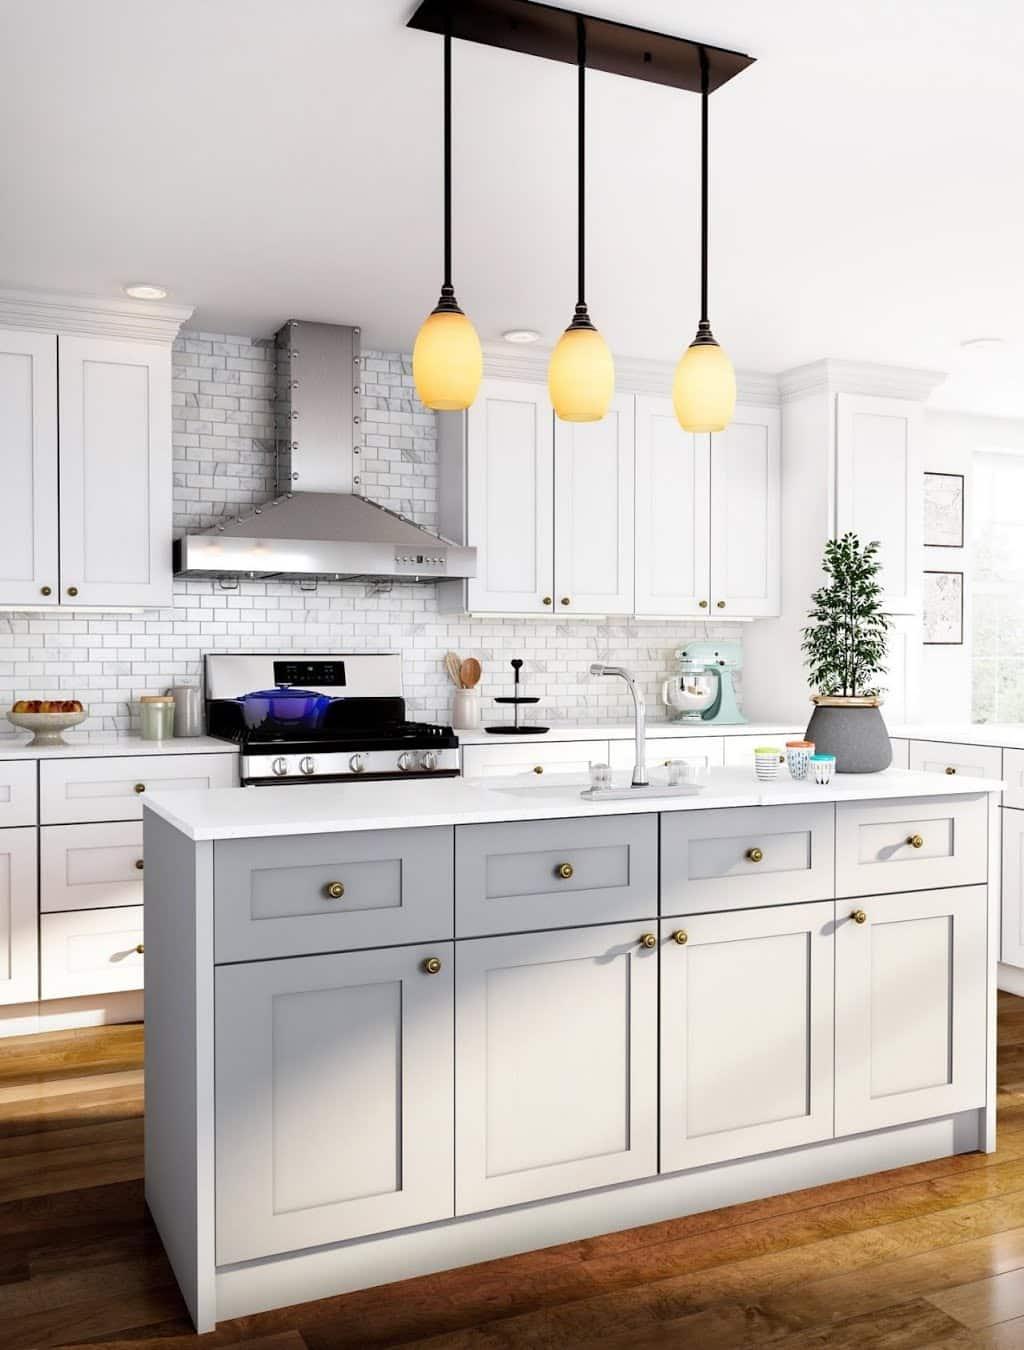 Open White and Silvertones Kitchen